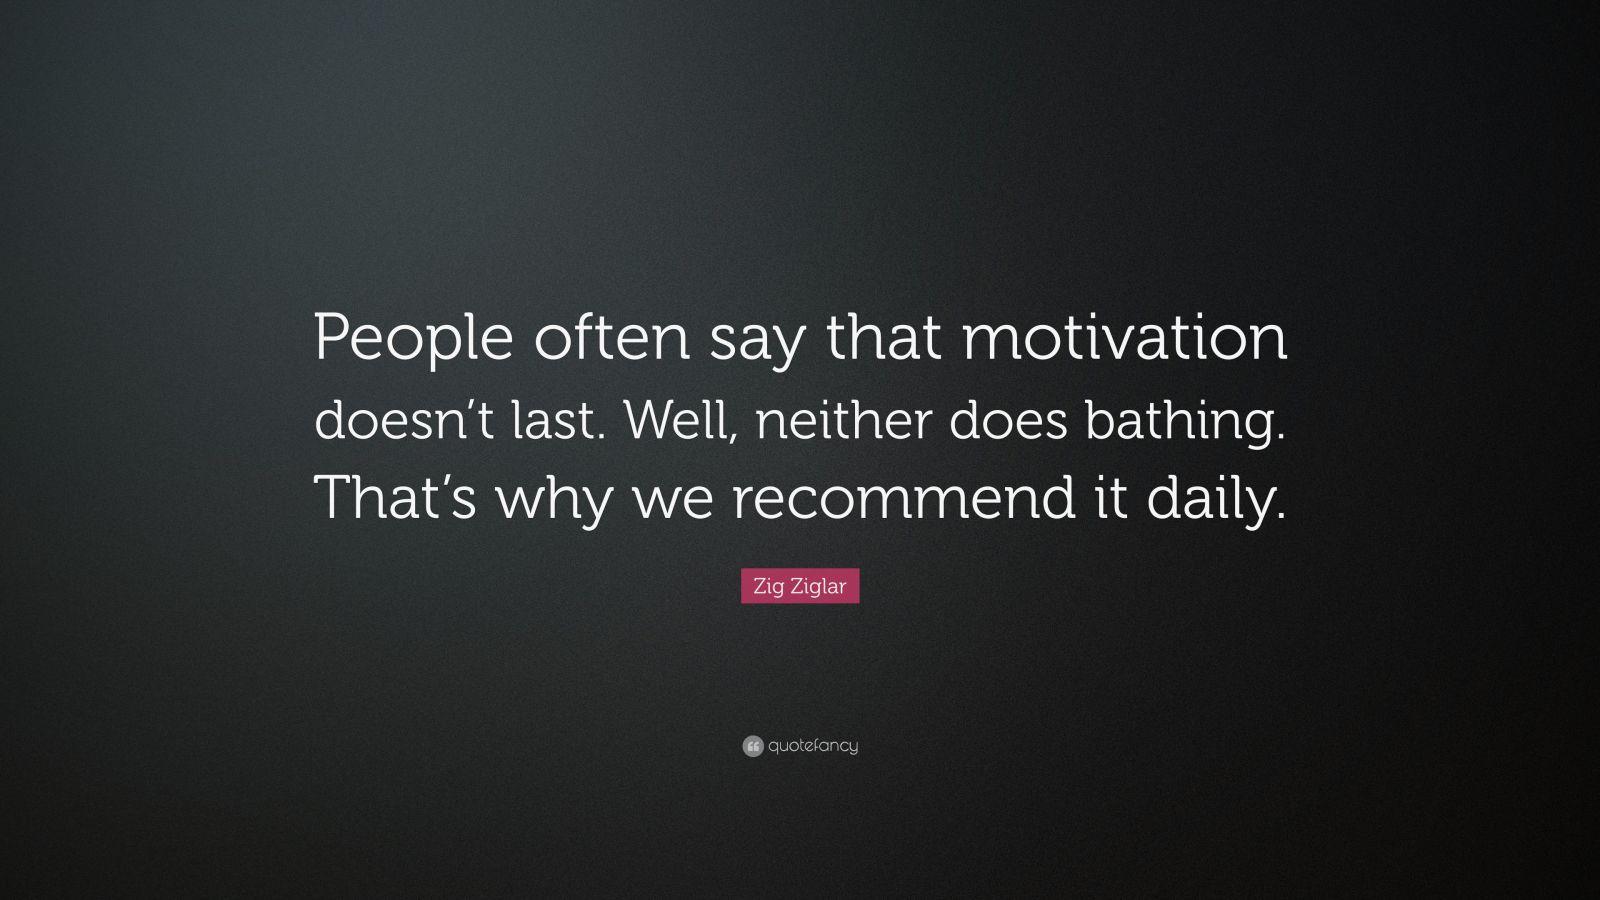 Zig Ziglar Motivation Doesn't Last Quote